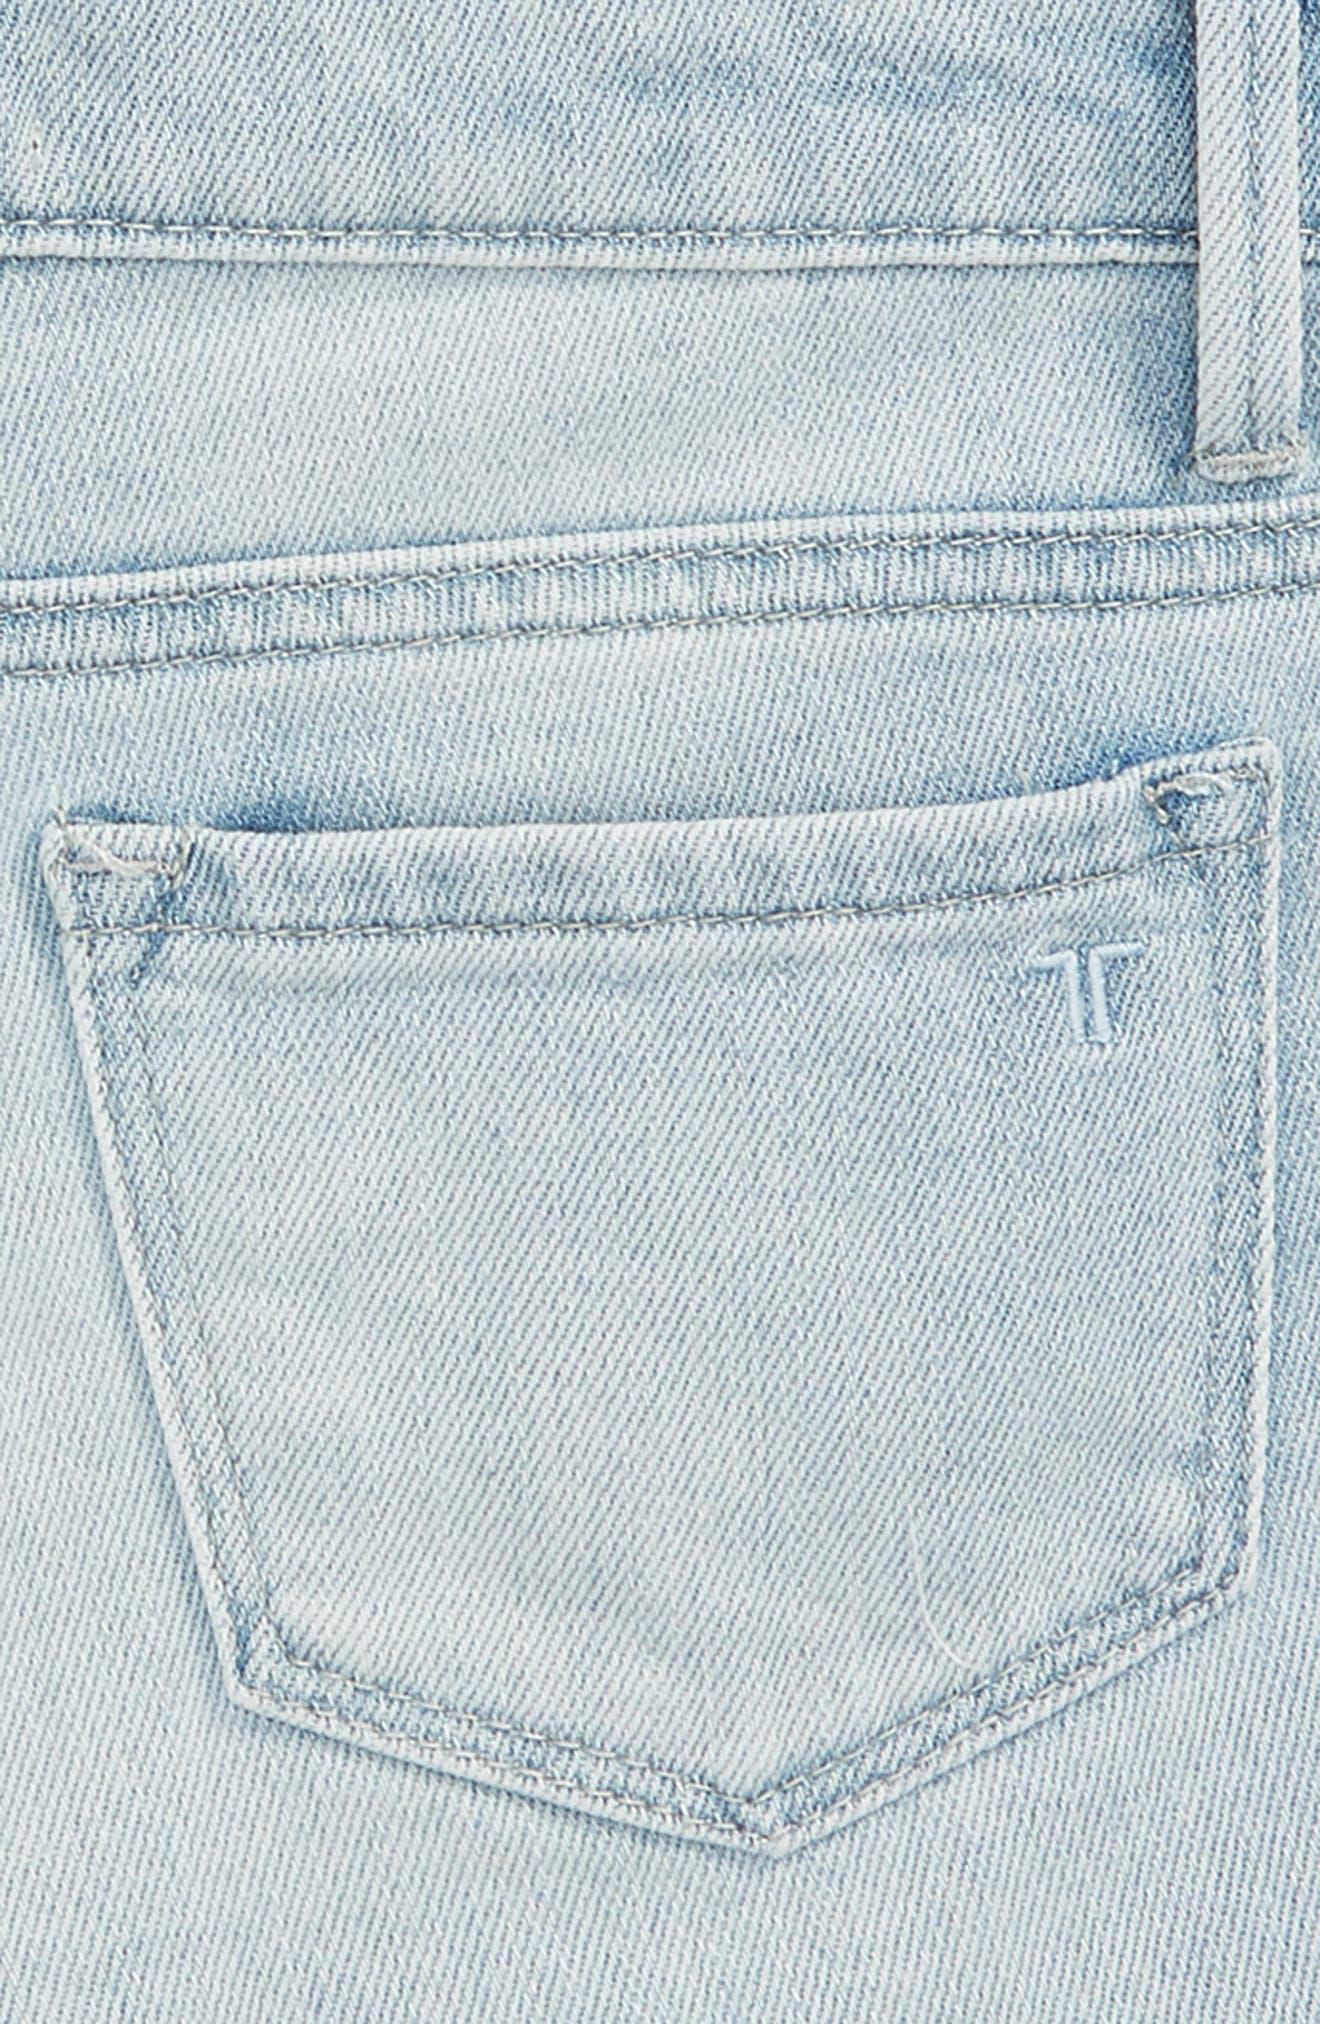 Lace Denim Shorts,                             Alternate thumbnail 3, color,                             400